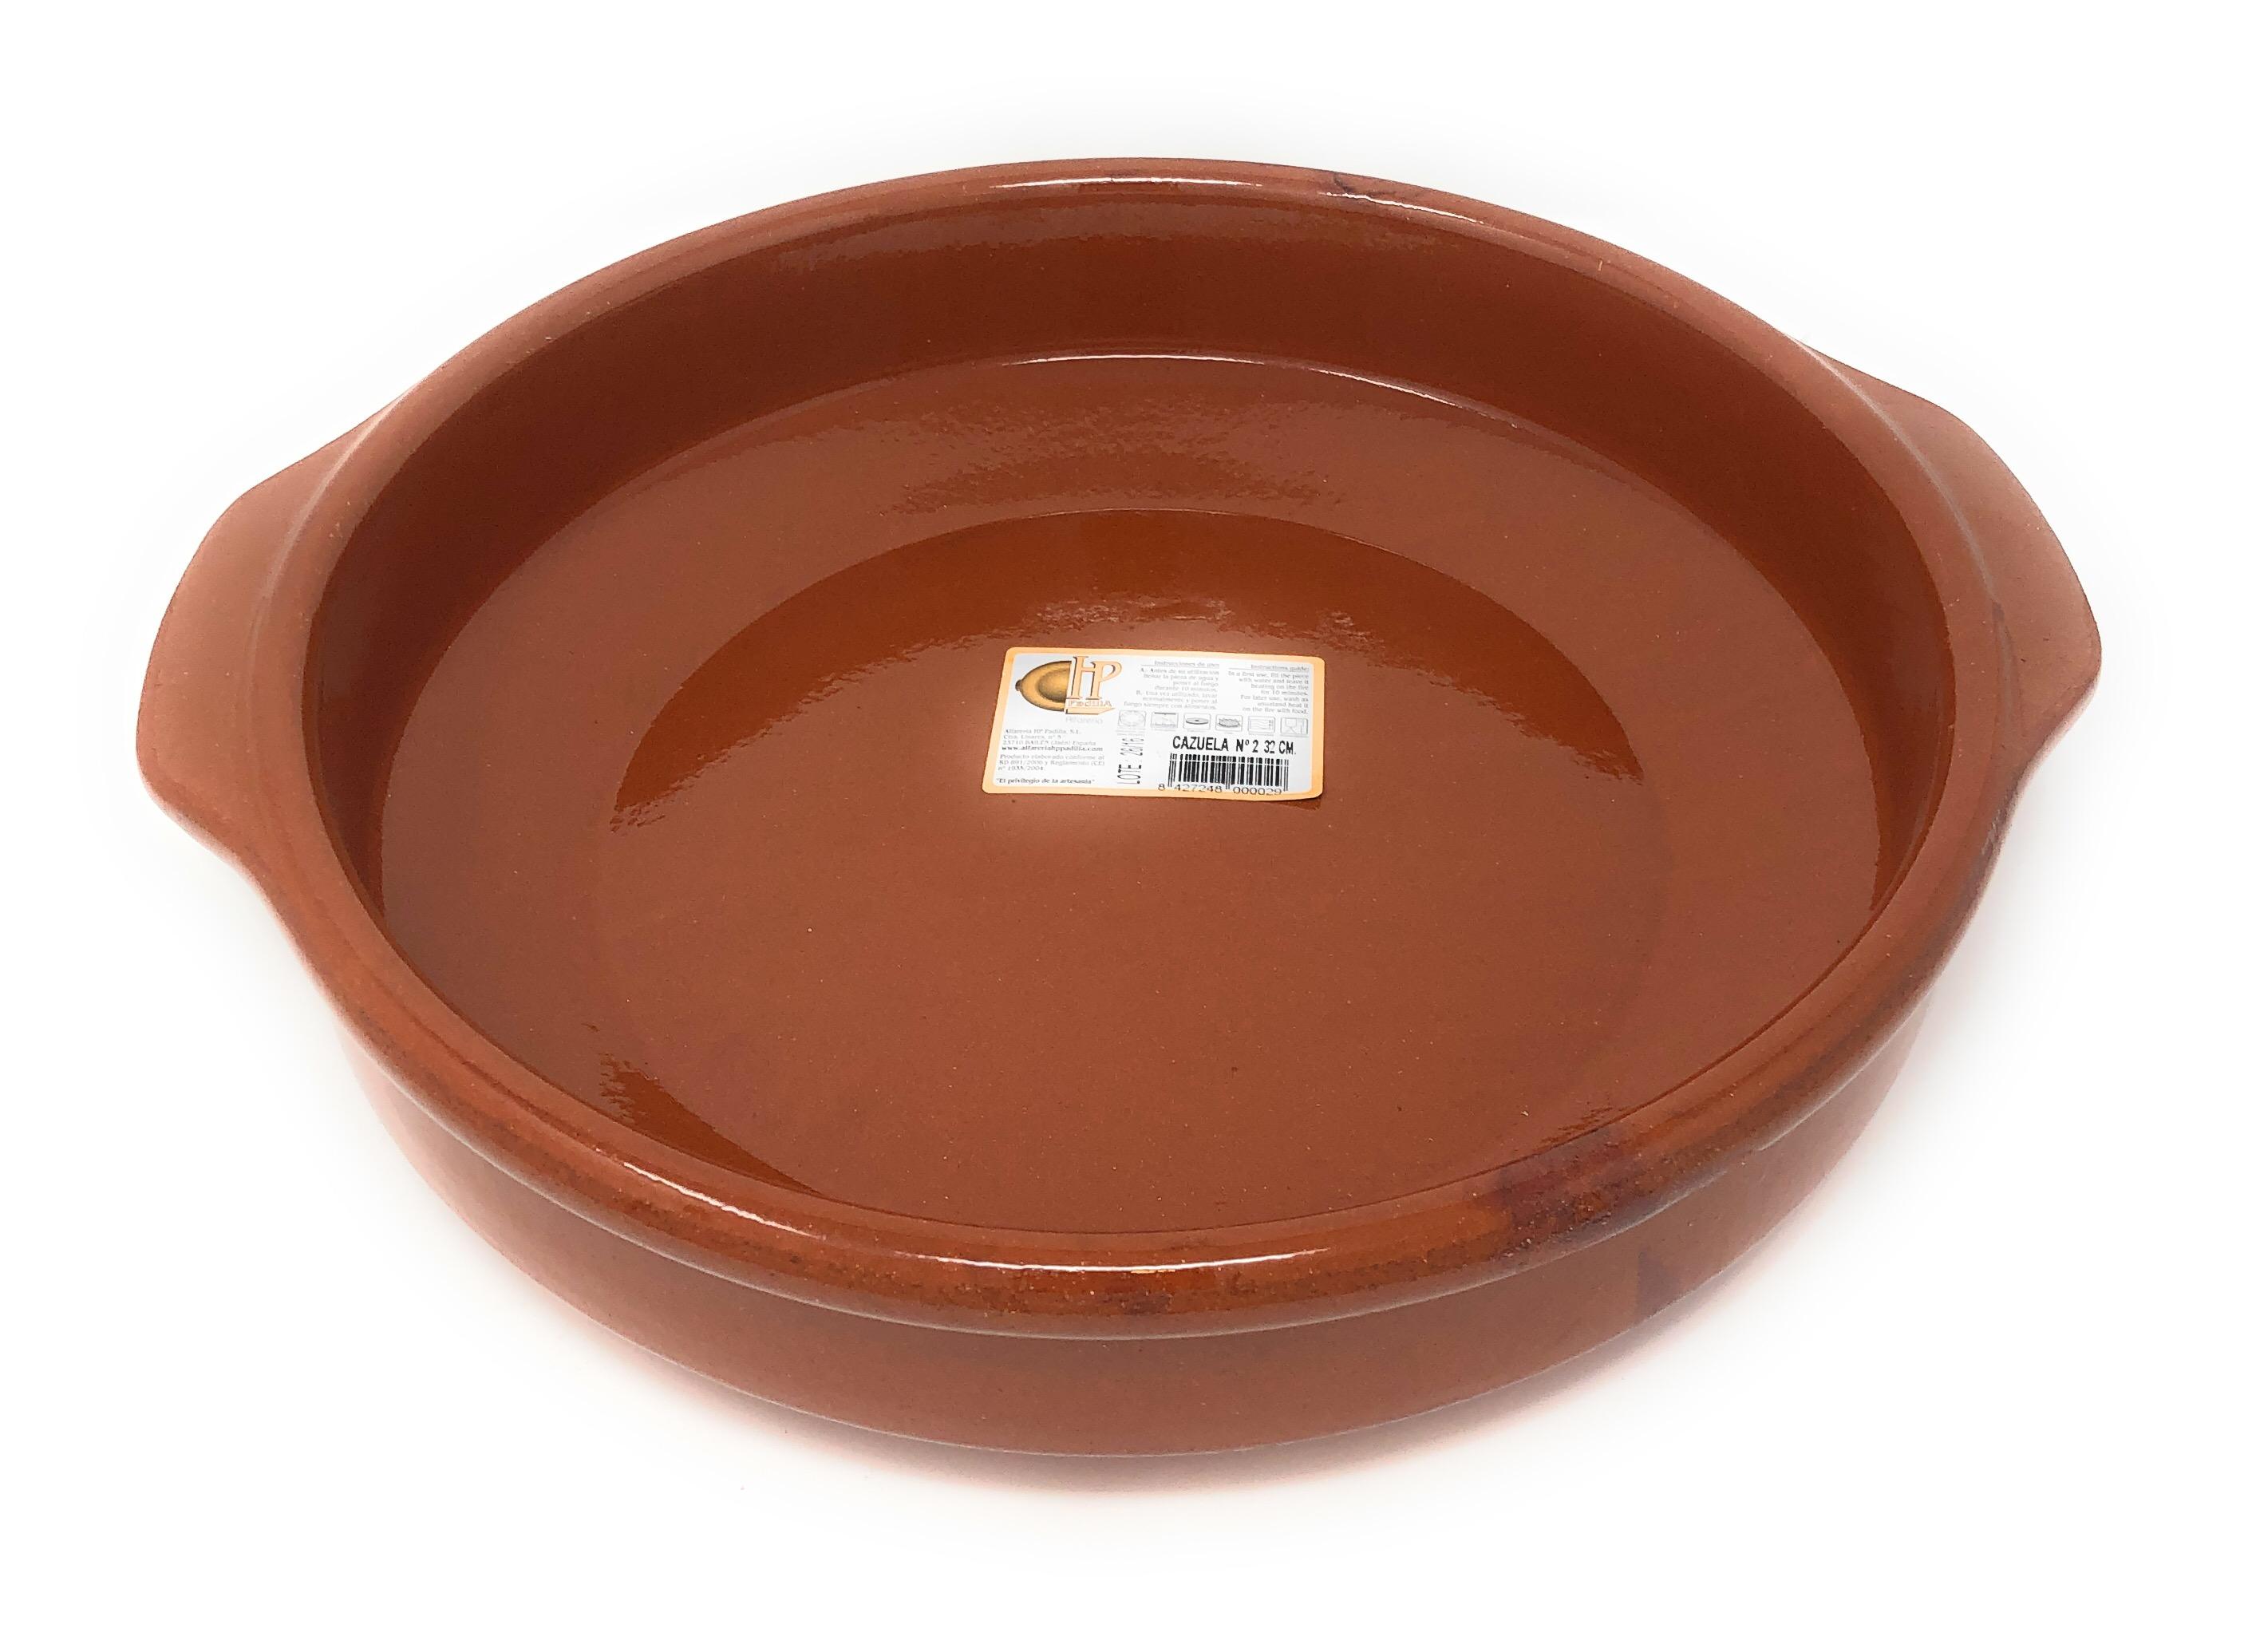 Alfareria Padilla Cazuela (Keramikschale), traditionel, flach, braun 32 cm